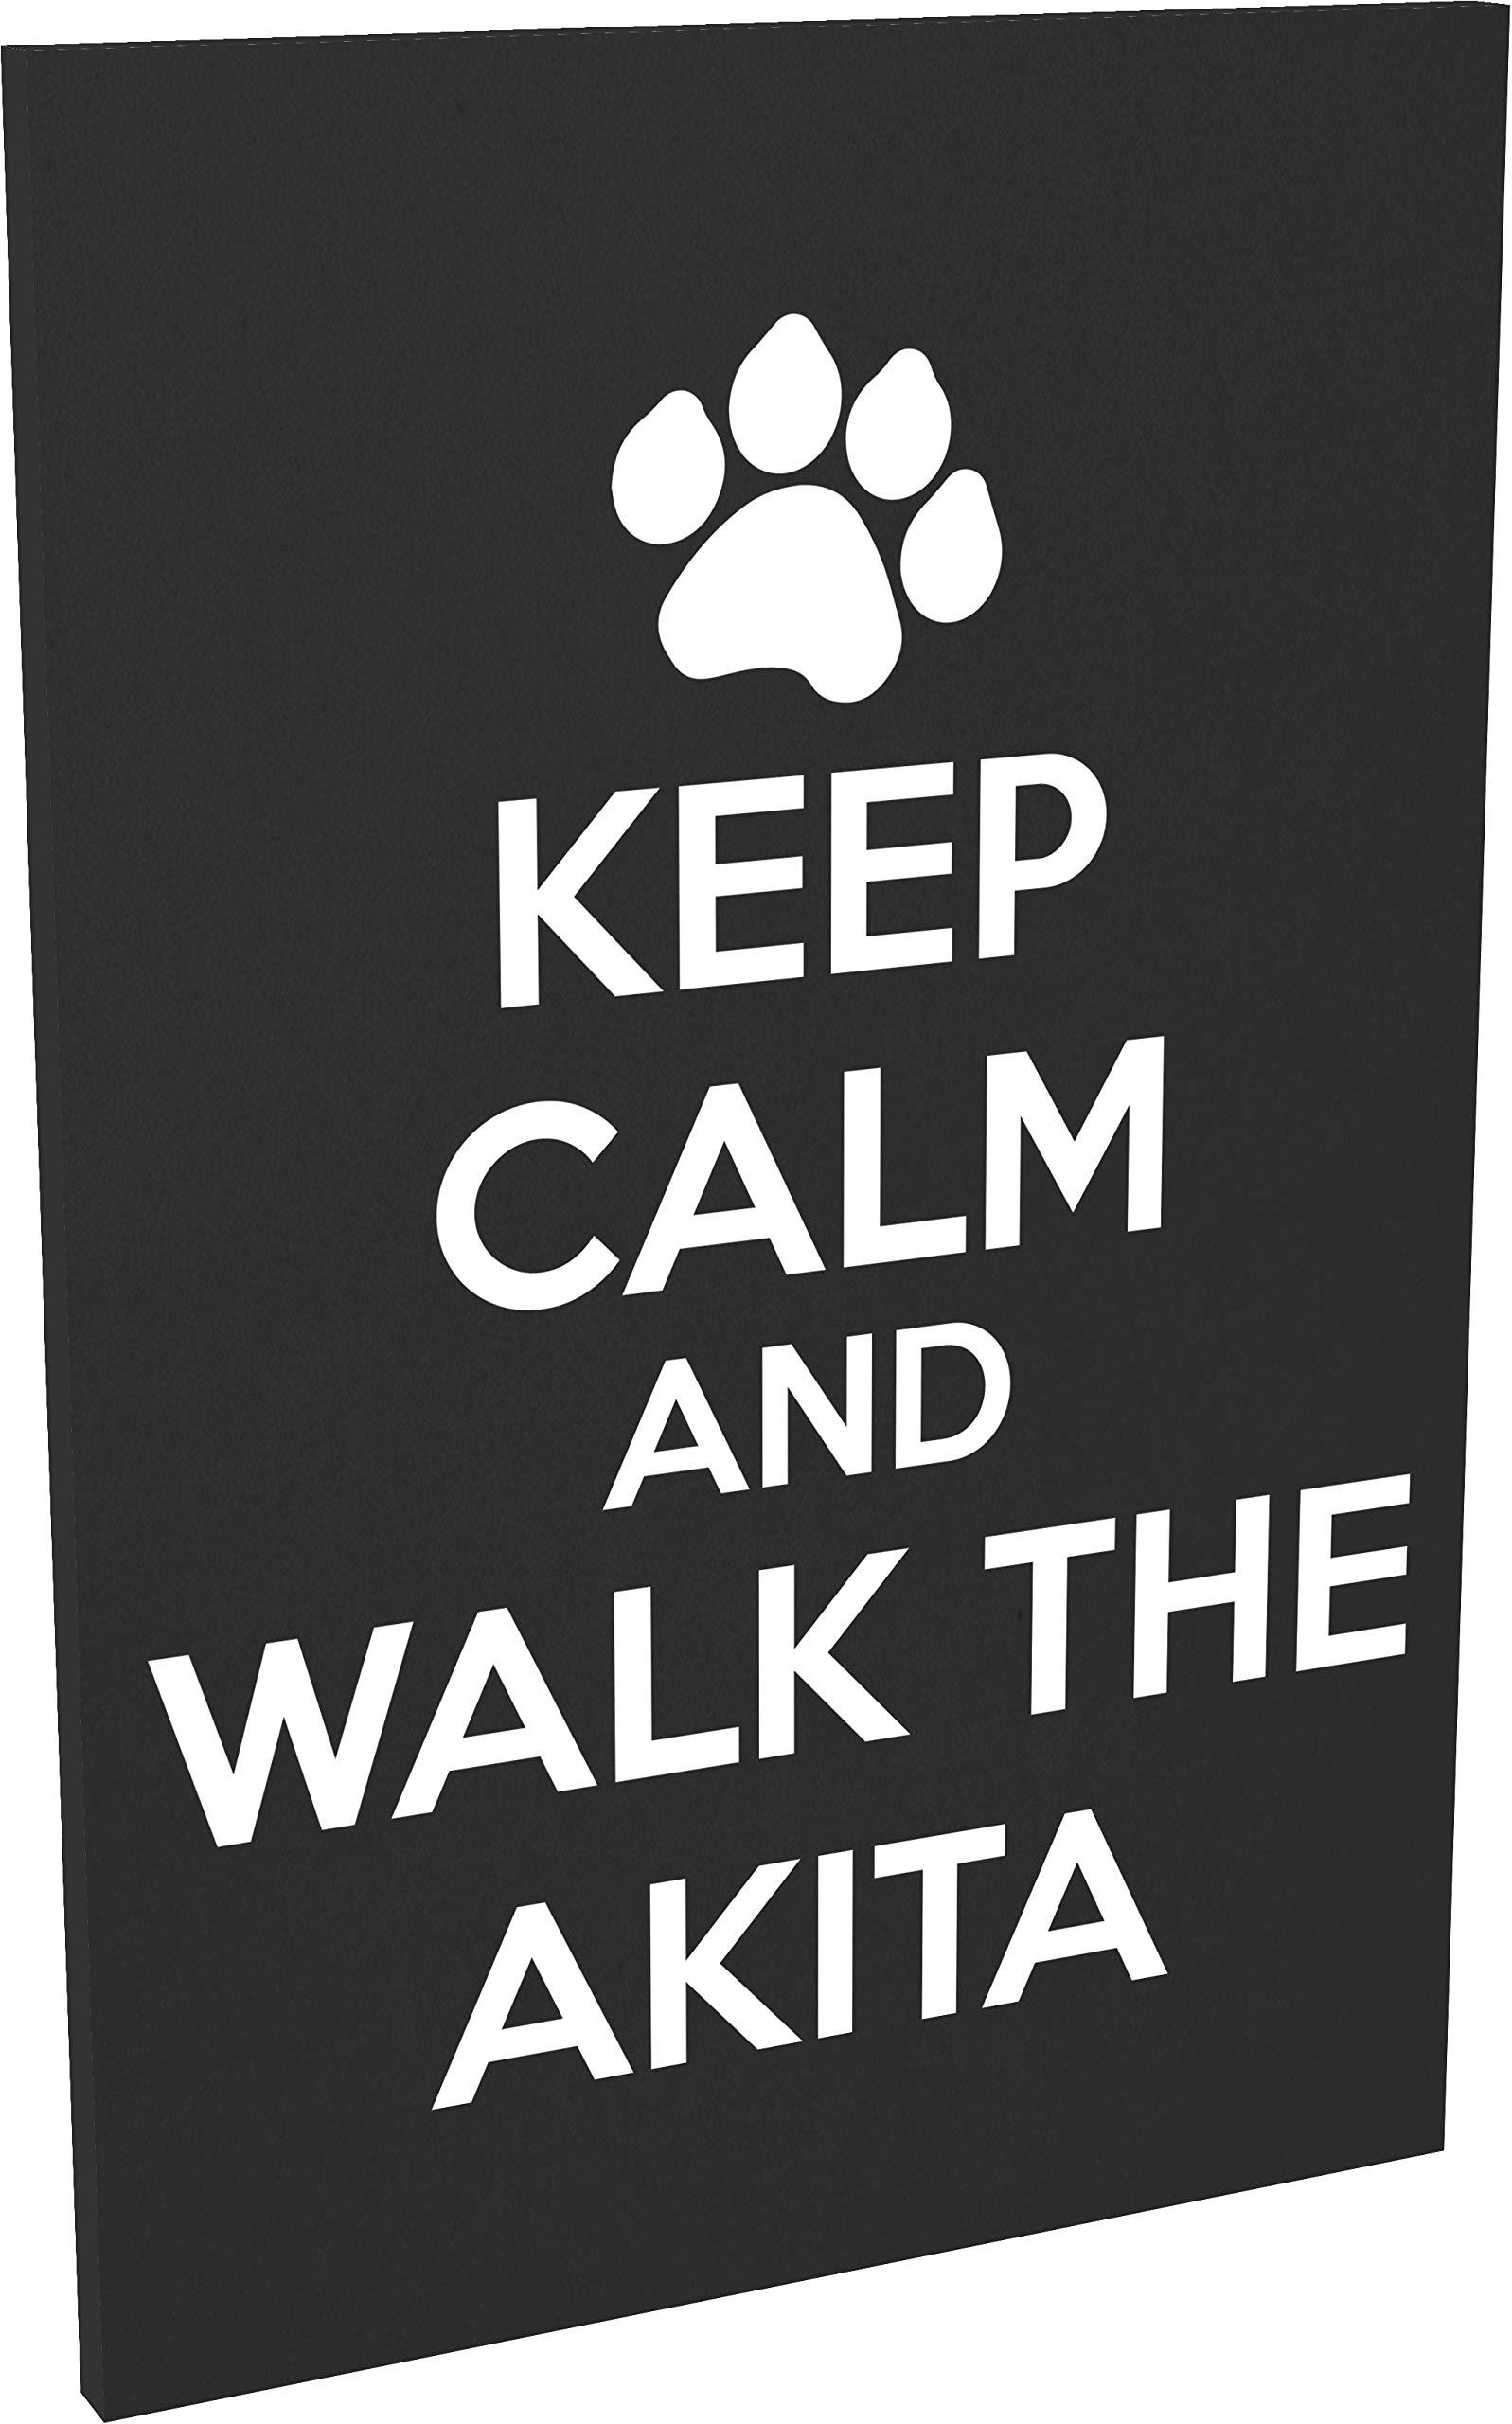 Hippowarehouse Keep calm and walk the akita – dog printed Fridge Magnet Hardboard 50.8mm x 76.2mm